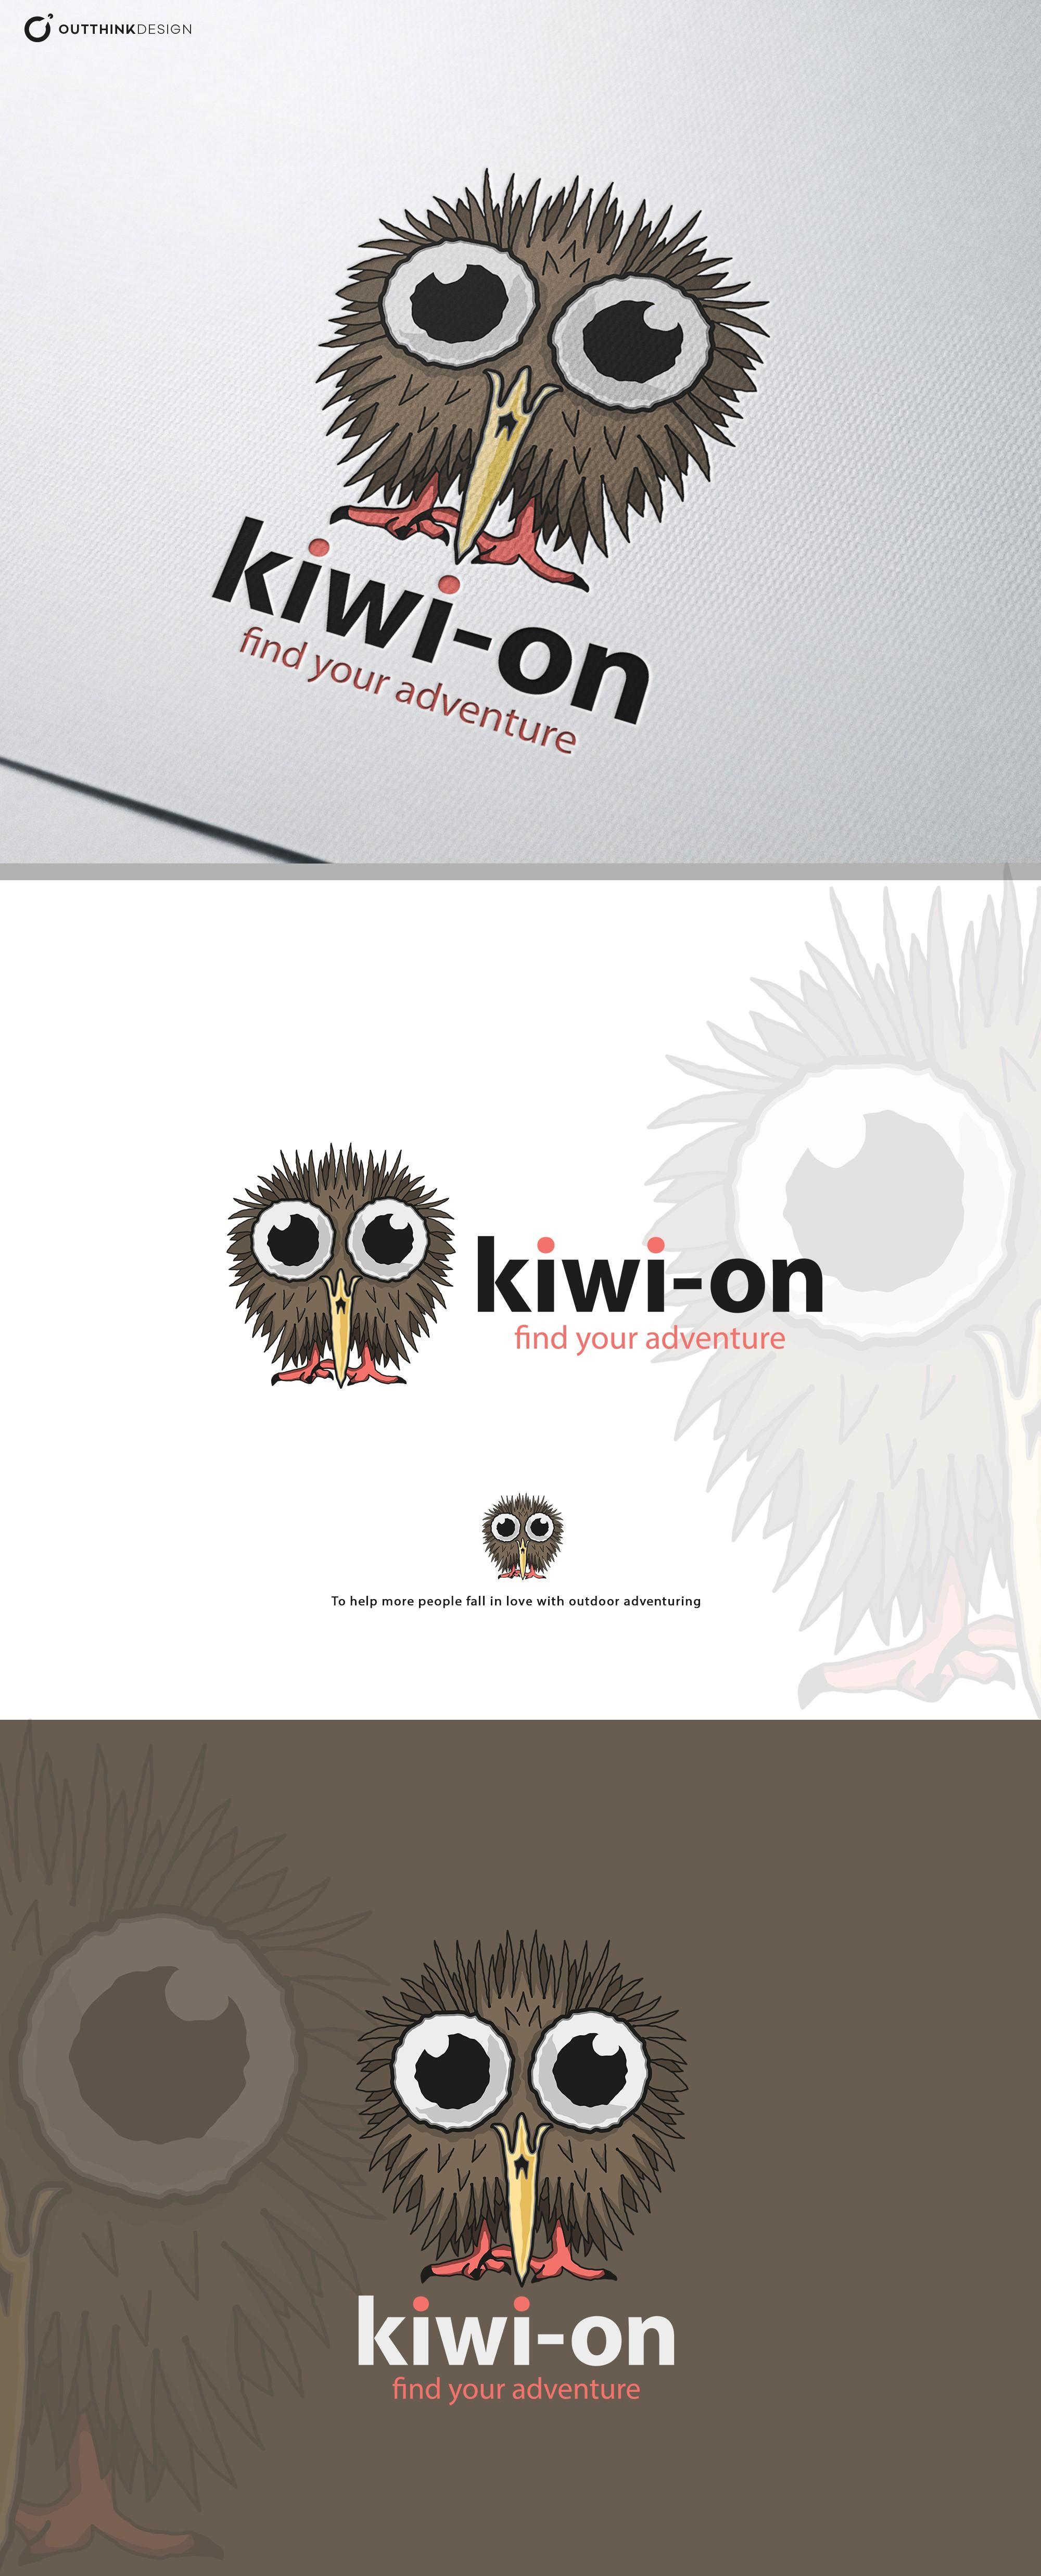 Logo for outdoor adventure brand - kiwisutra